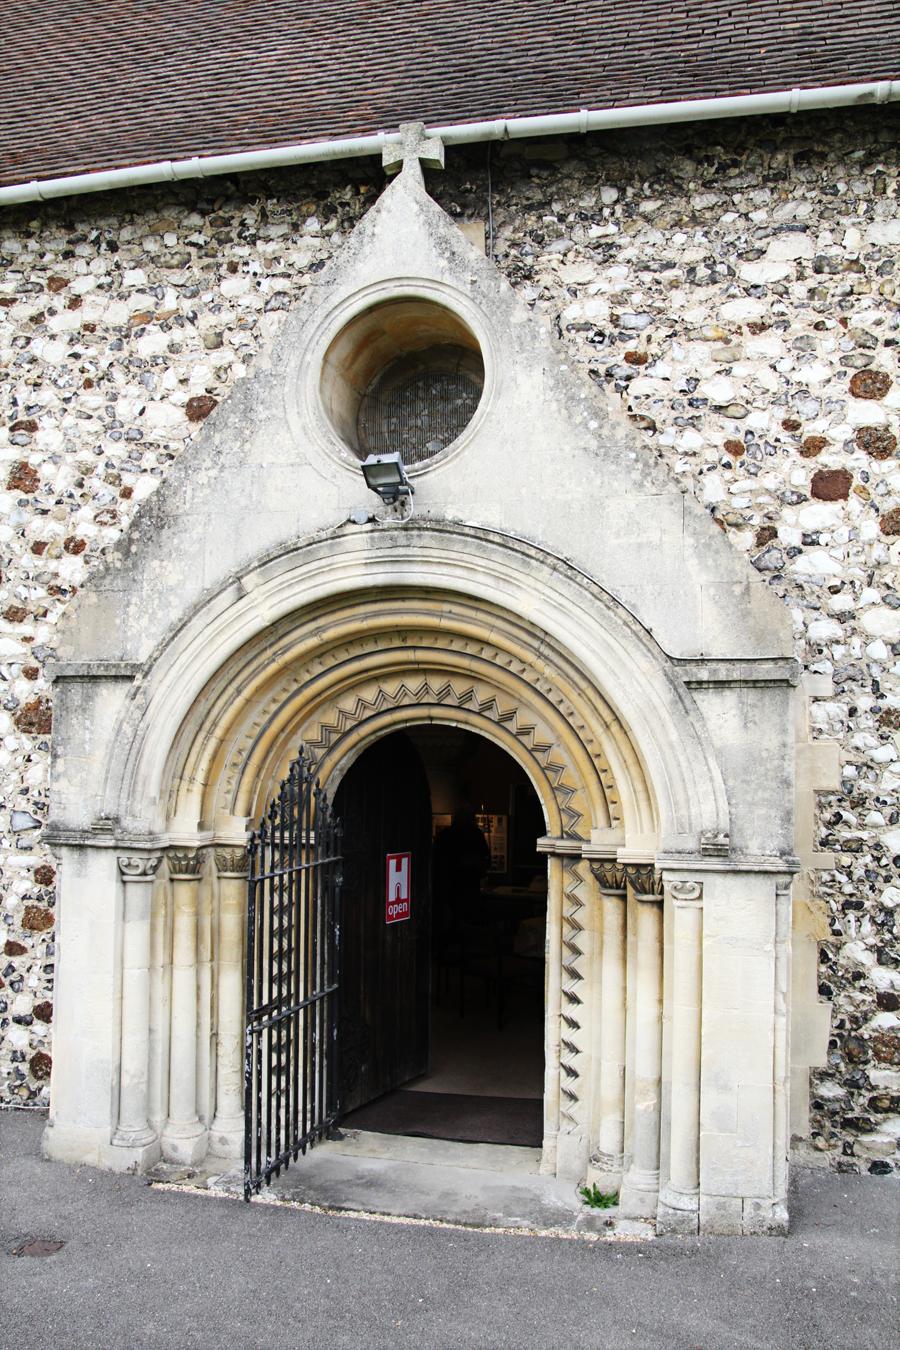 Porta da fachada sul da Igreja St Laurence